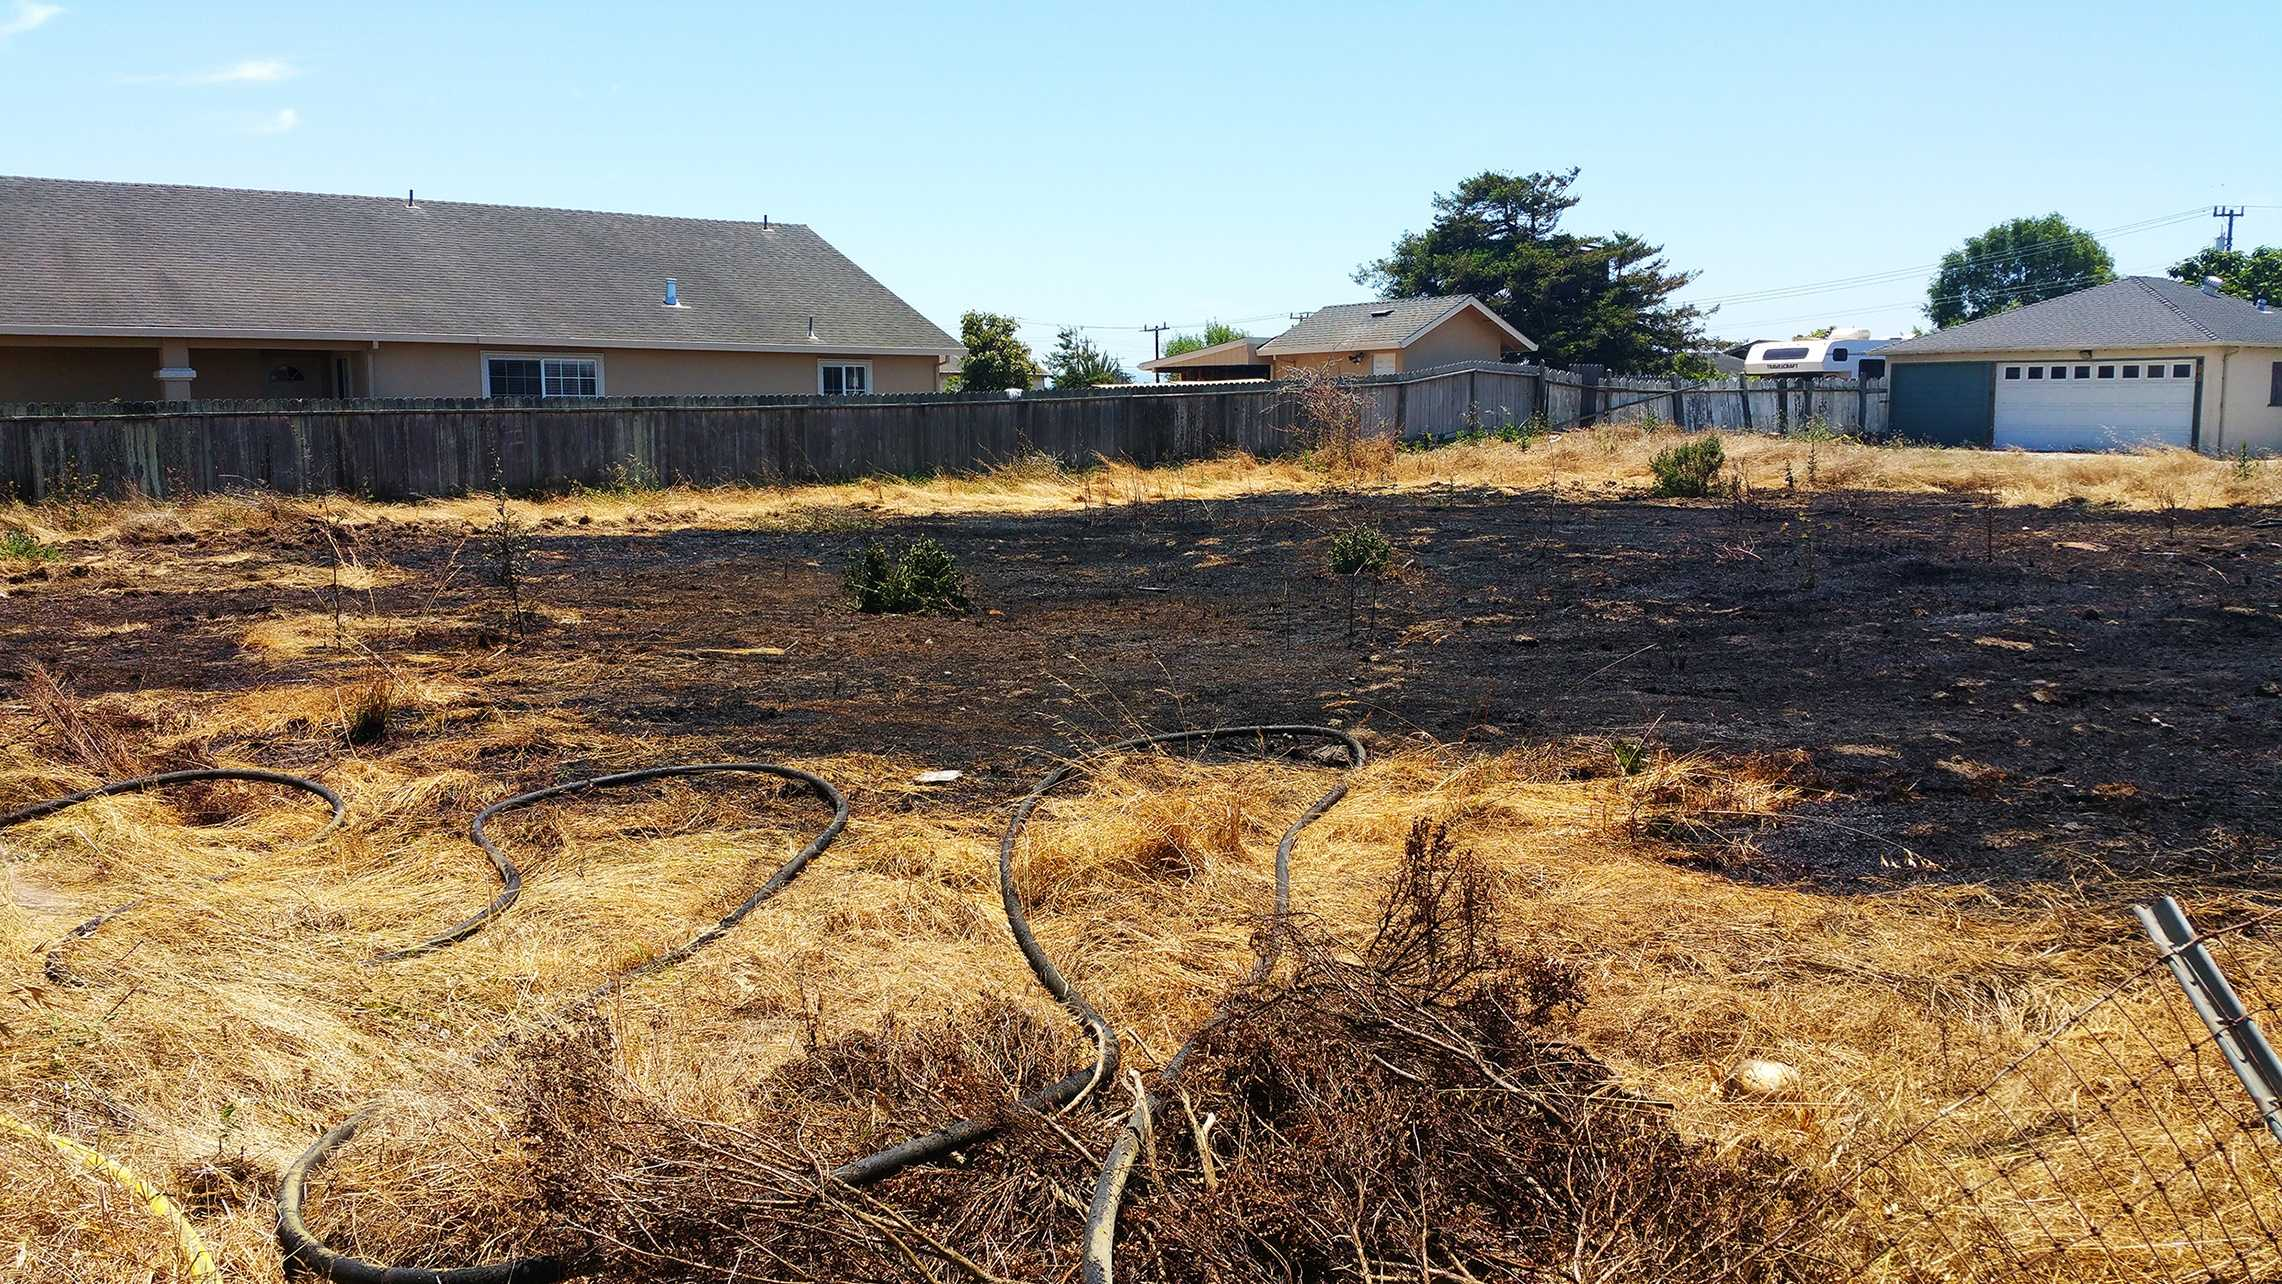 Castroville grass fire (June 29, 2015)